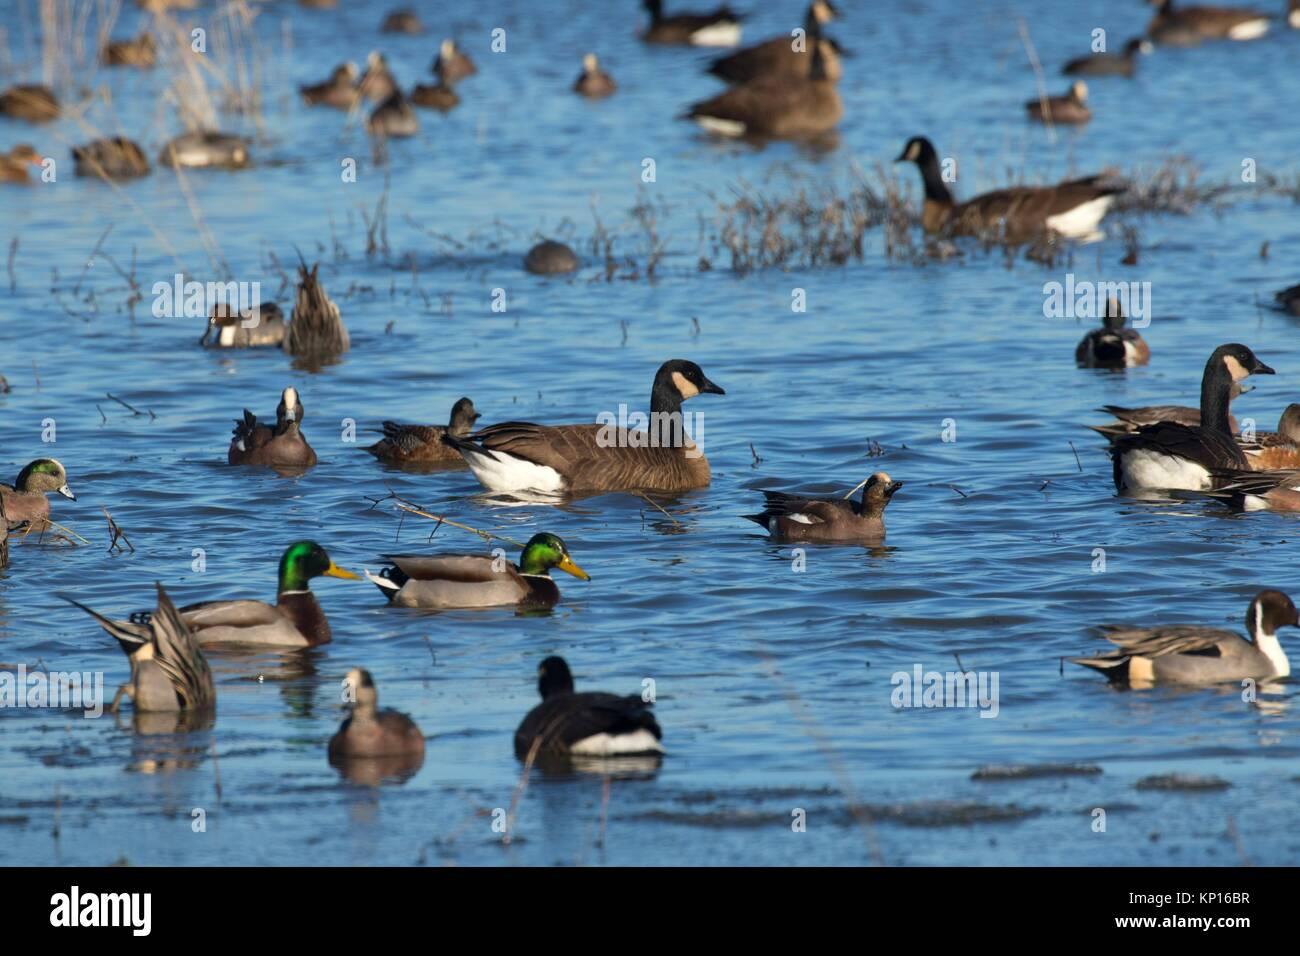 Winter waterfowl at McFadden Marsh, William Finley National Wildlife Refuge, Oregon. - Stock Image